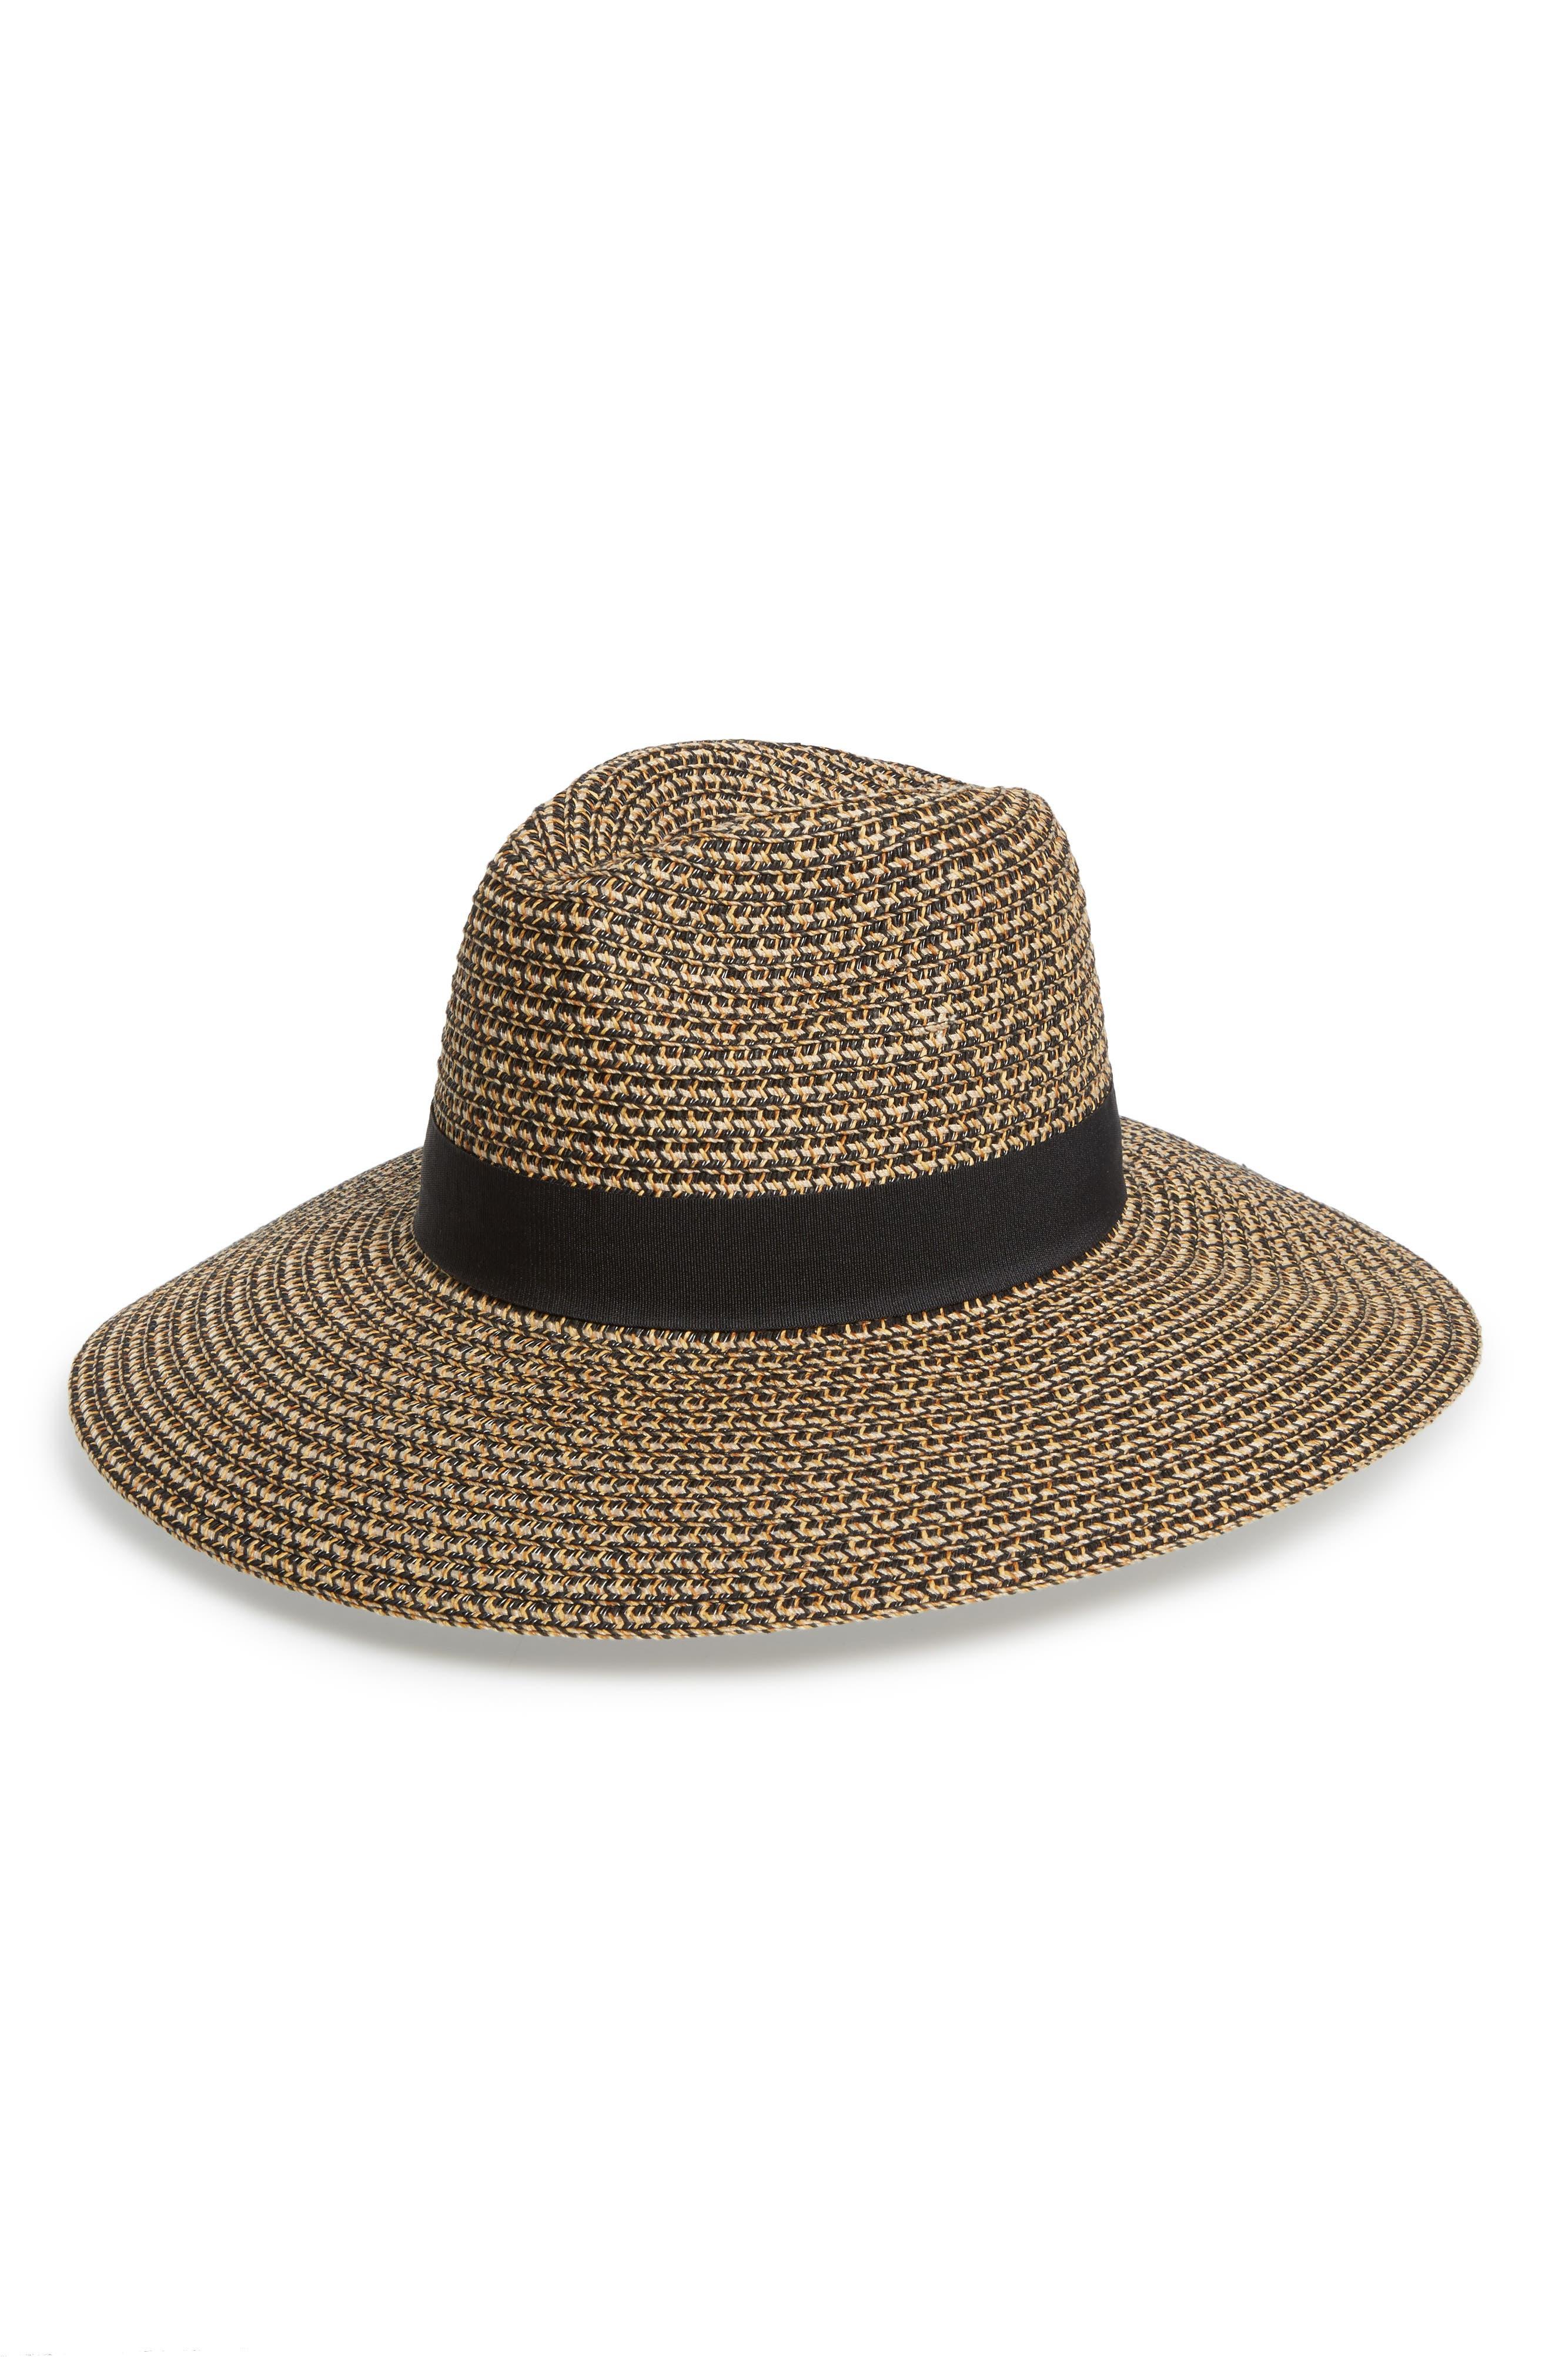 Main Image - Sole Society Woven Straw Sun Hat